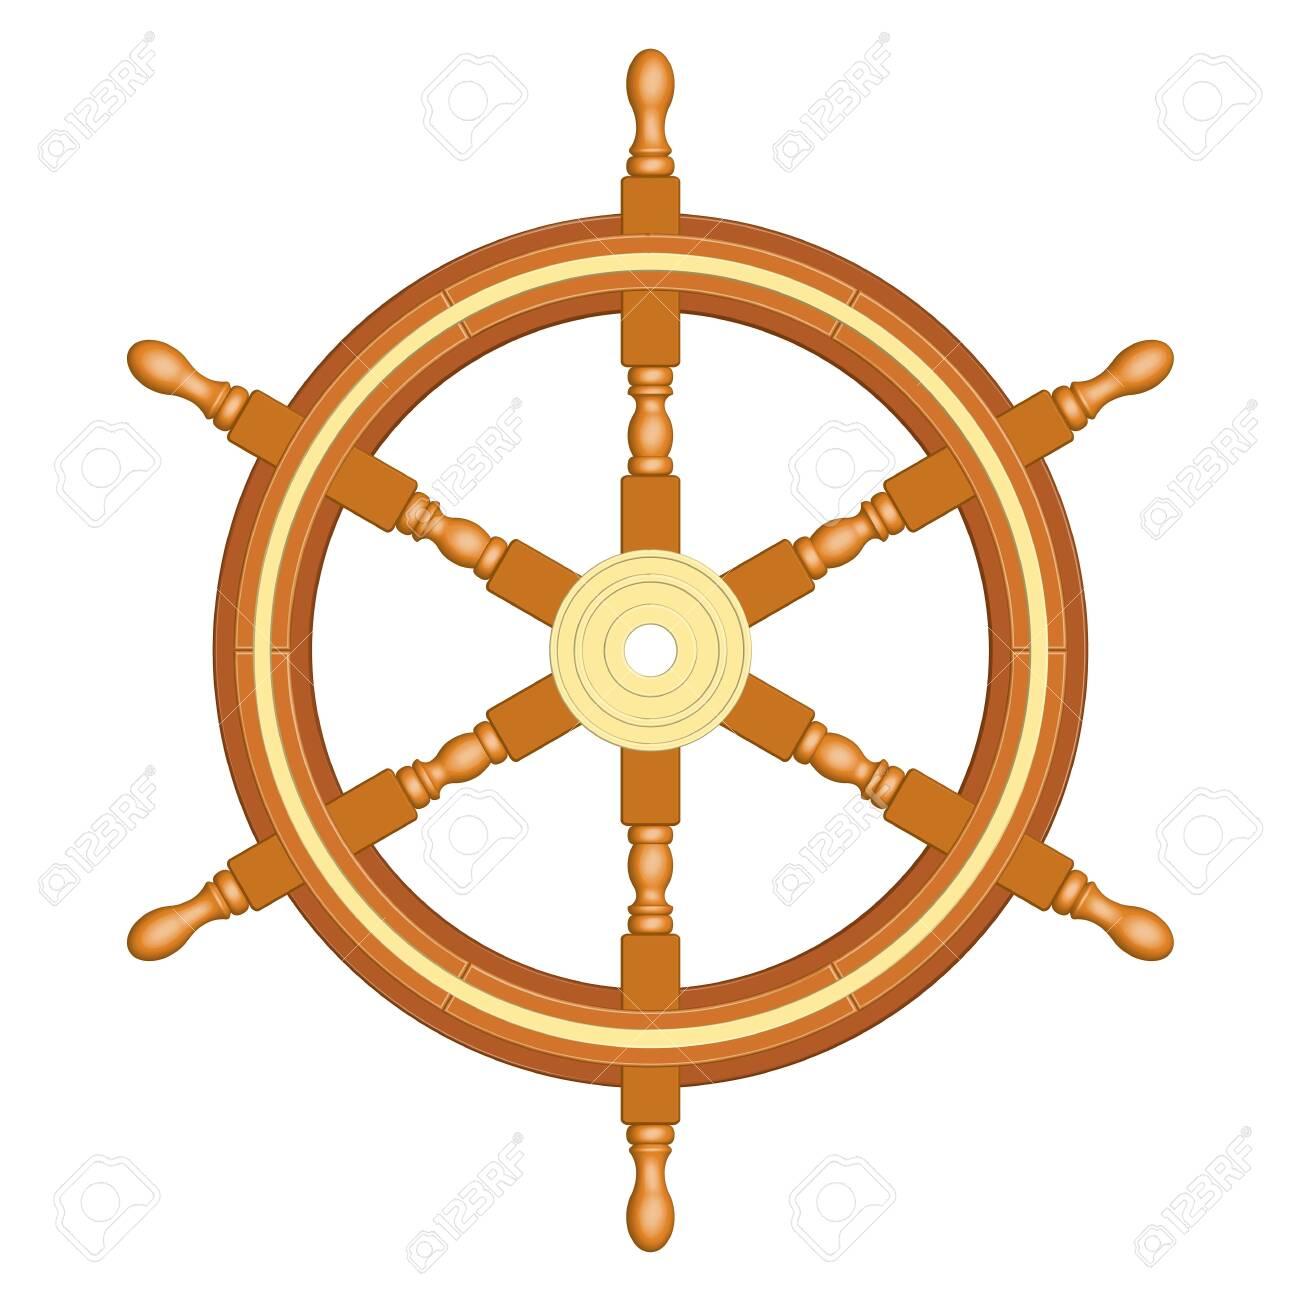 6 spoke wooden ship wheel. Vintage style. 3D effect vector - 142219724